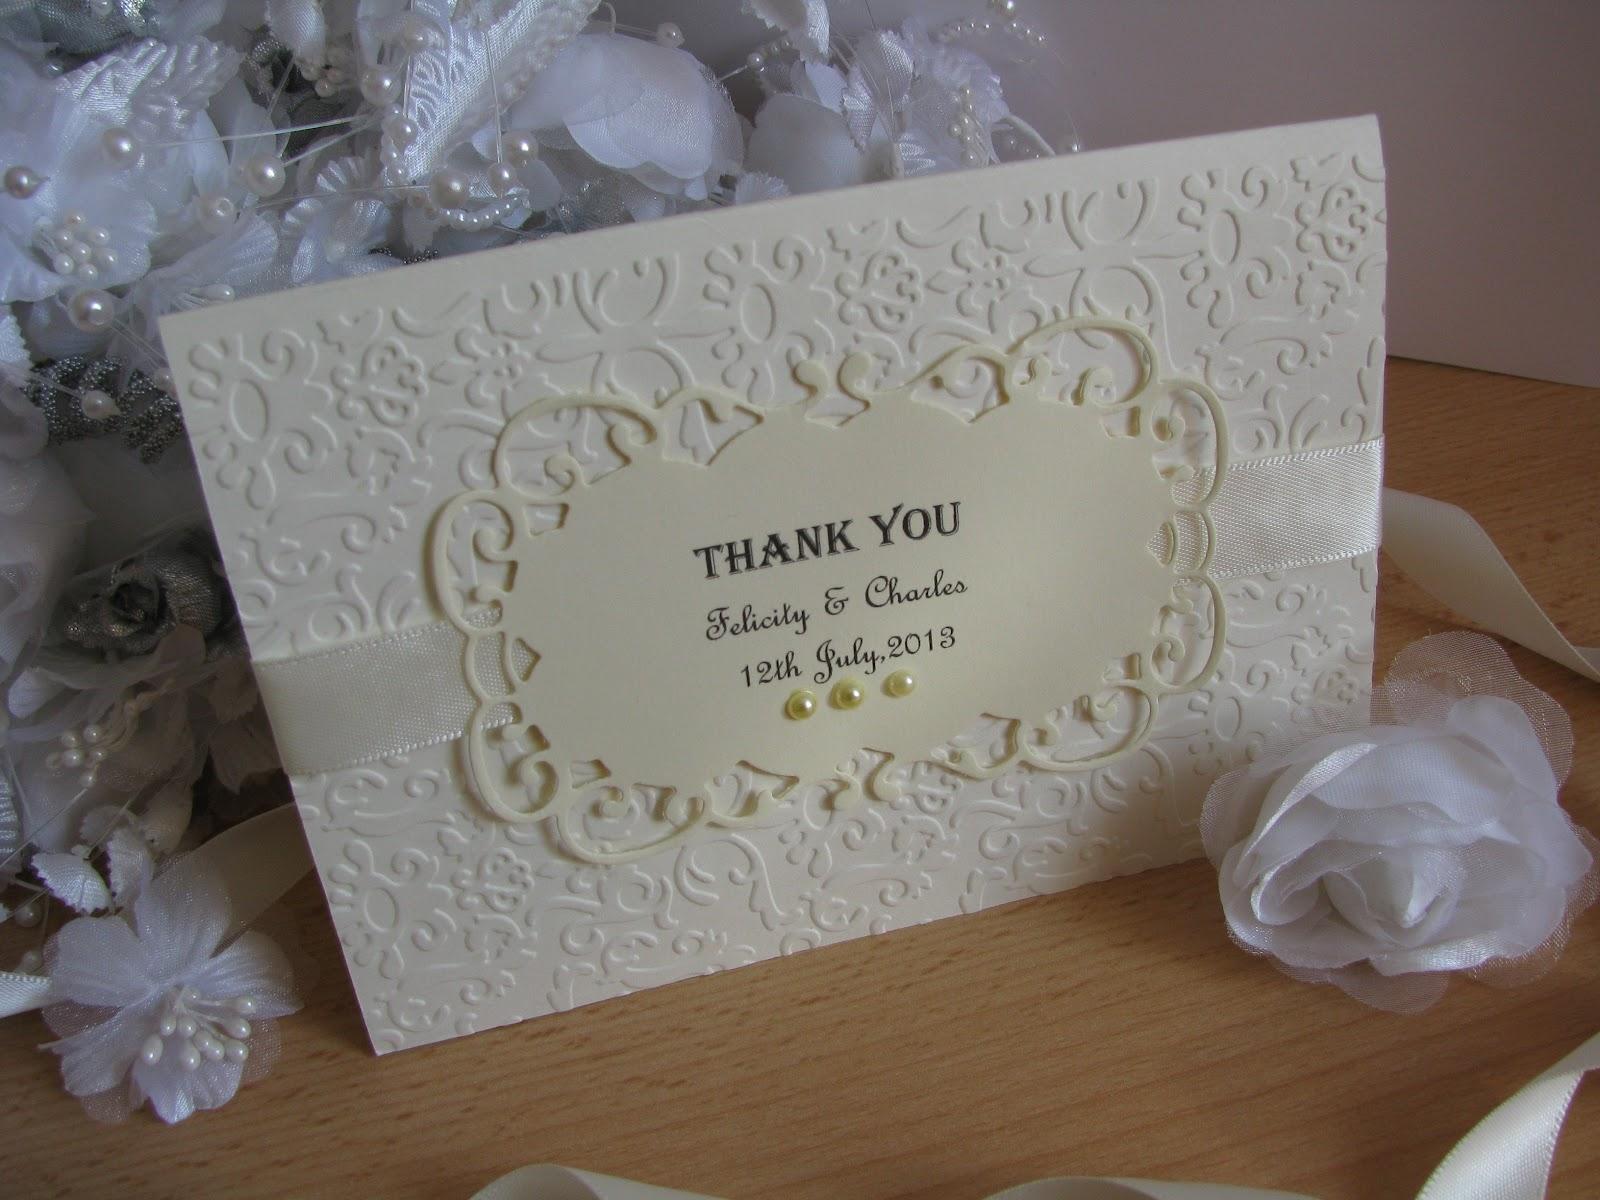 thank you wedding cards Personalised Vintage Wedding Invitation Stationery set Handmade offer 10 off eBay